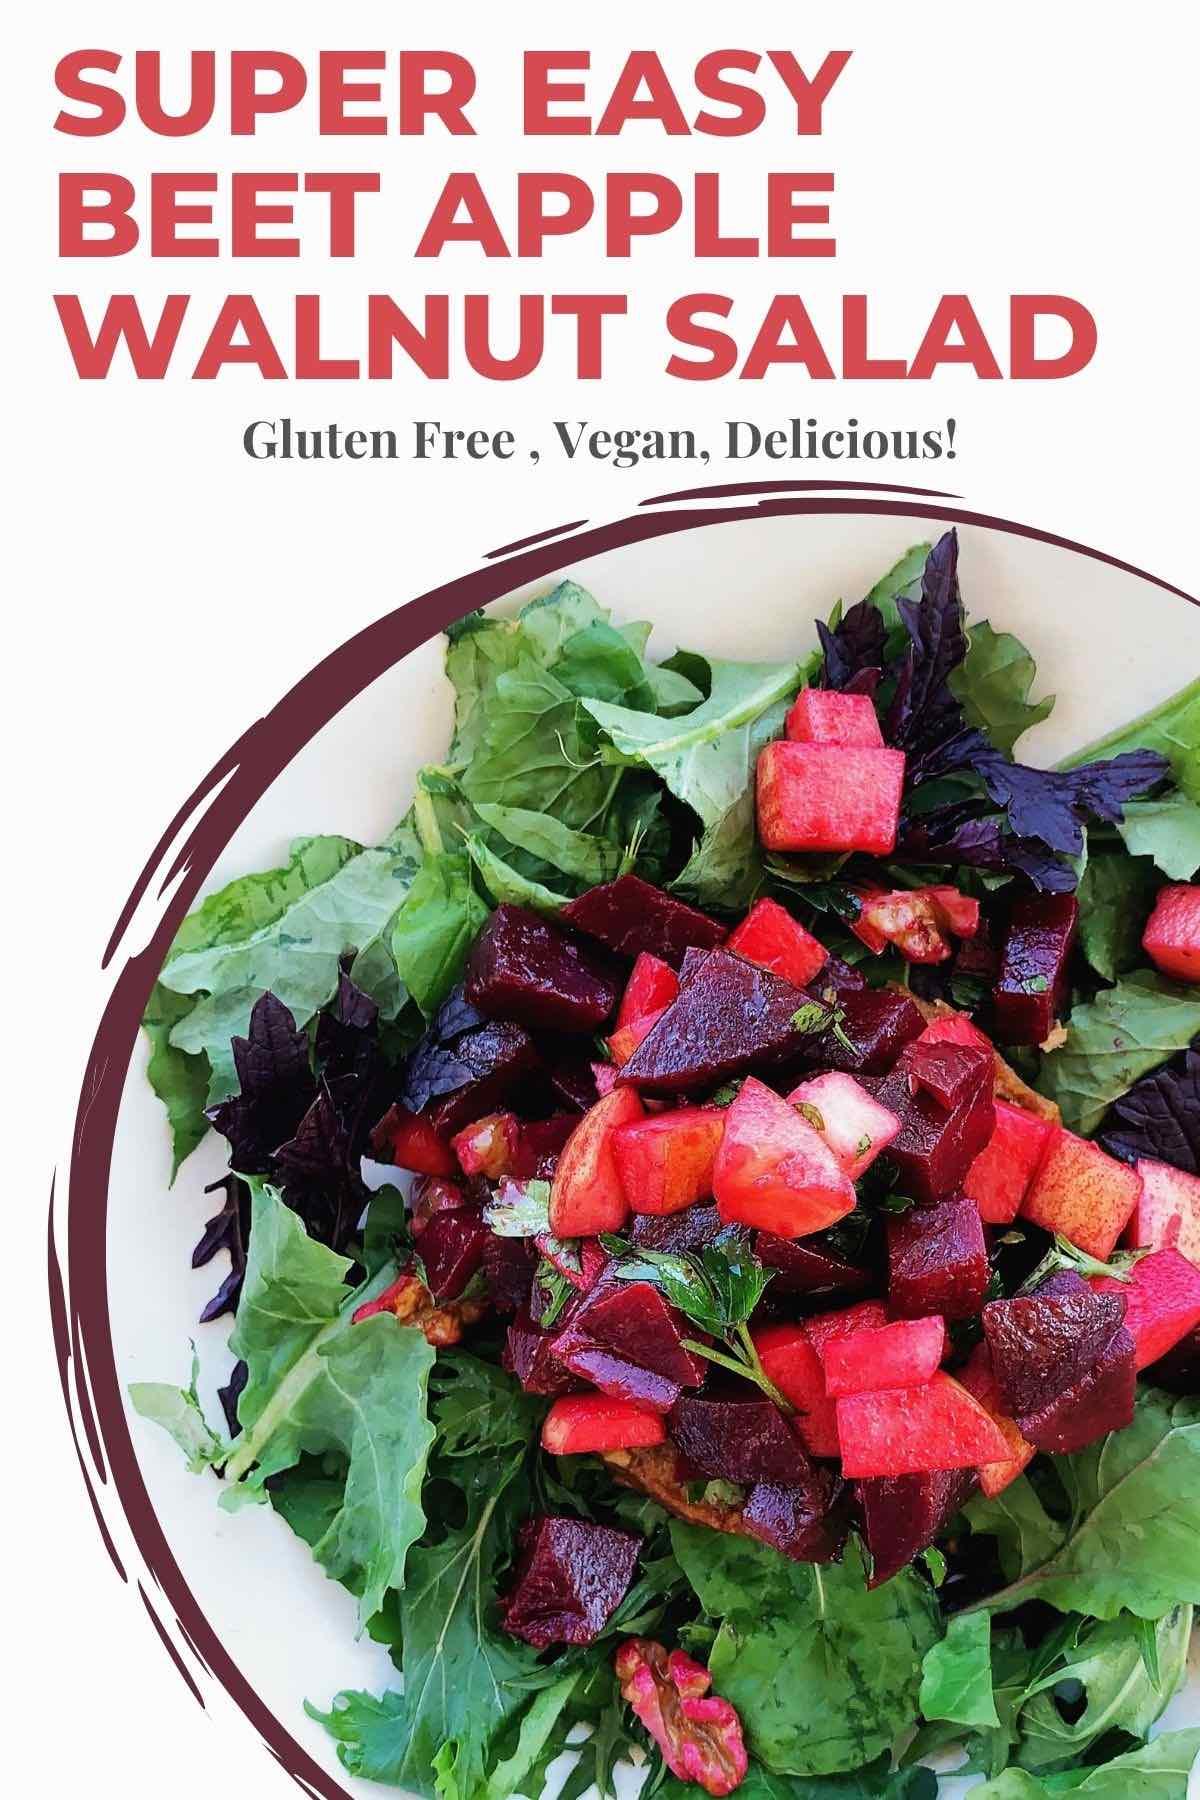 Beet apple walnut salad on a white plate with text overlay-Super Easy Beet Apple Walnut Salad, Gluten Free, Vegan, Delicious.